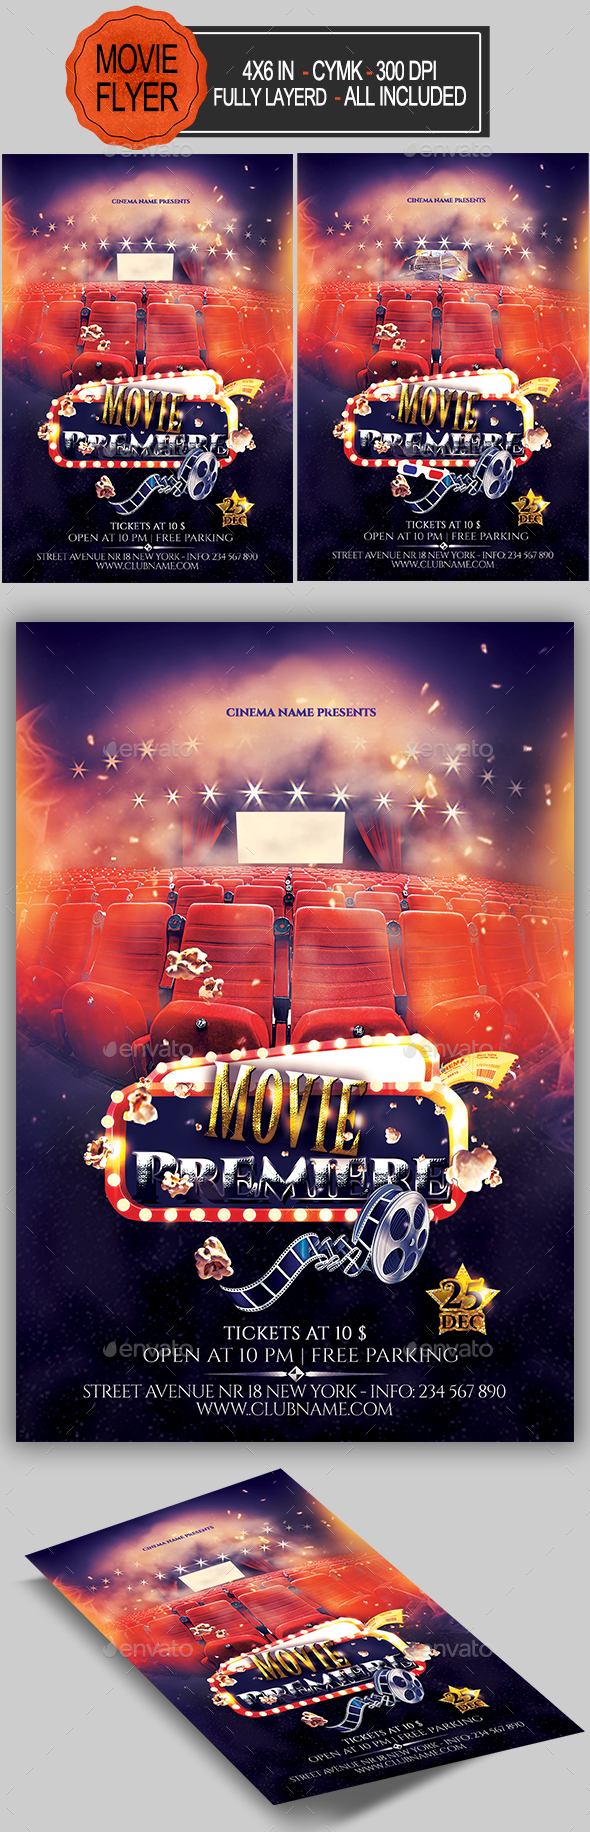 Premiere Movie Flyer — Photoshop PSD #premiere #oscar • Download ➝ https://graphicriver.net/item/premiere-movie-flyer/19180781?ref=pxcr